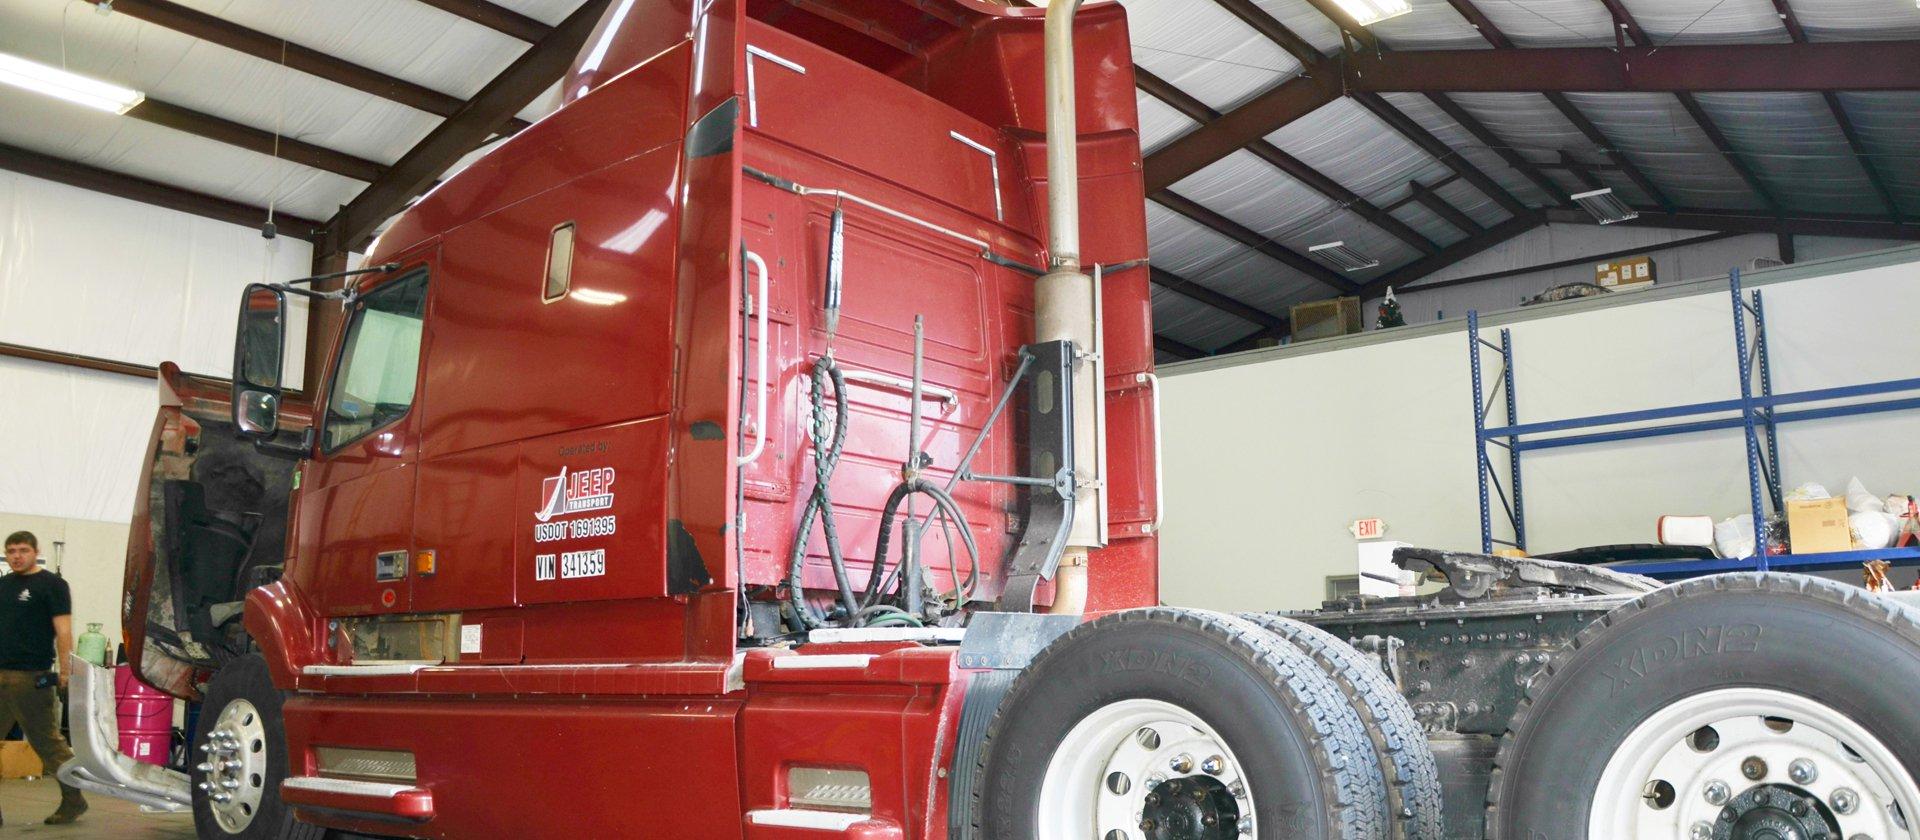 Mobile Truck Maintenance Near Me Diesel Shop Tractor